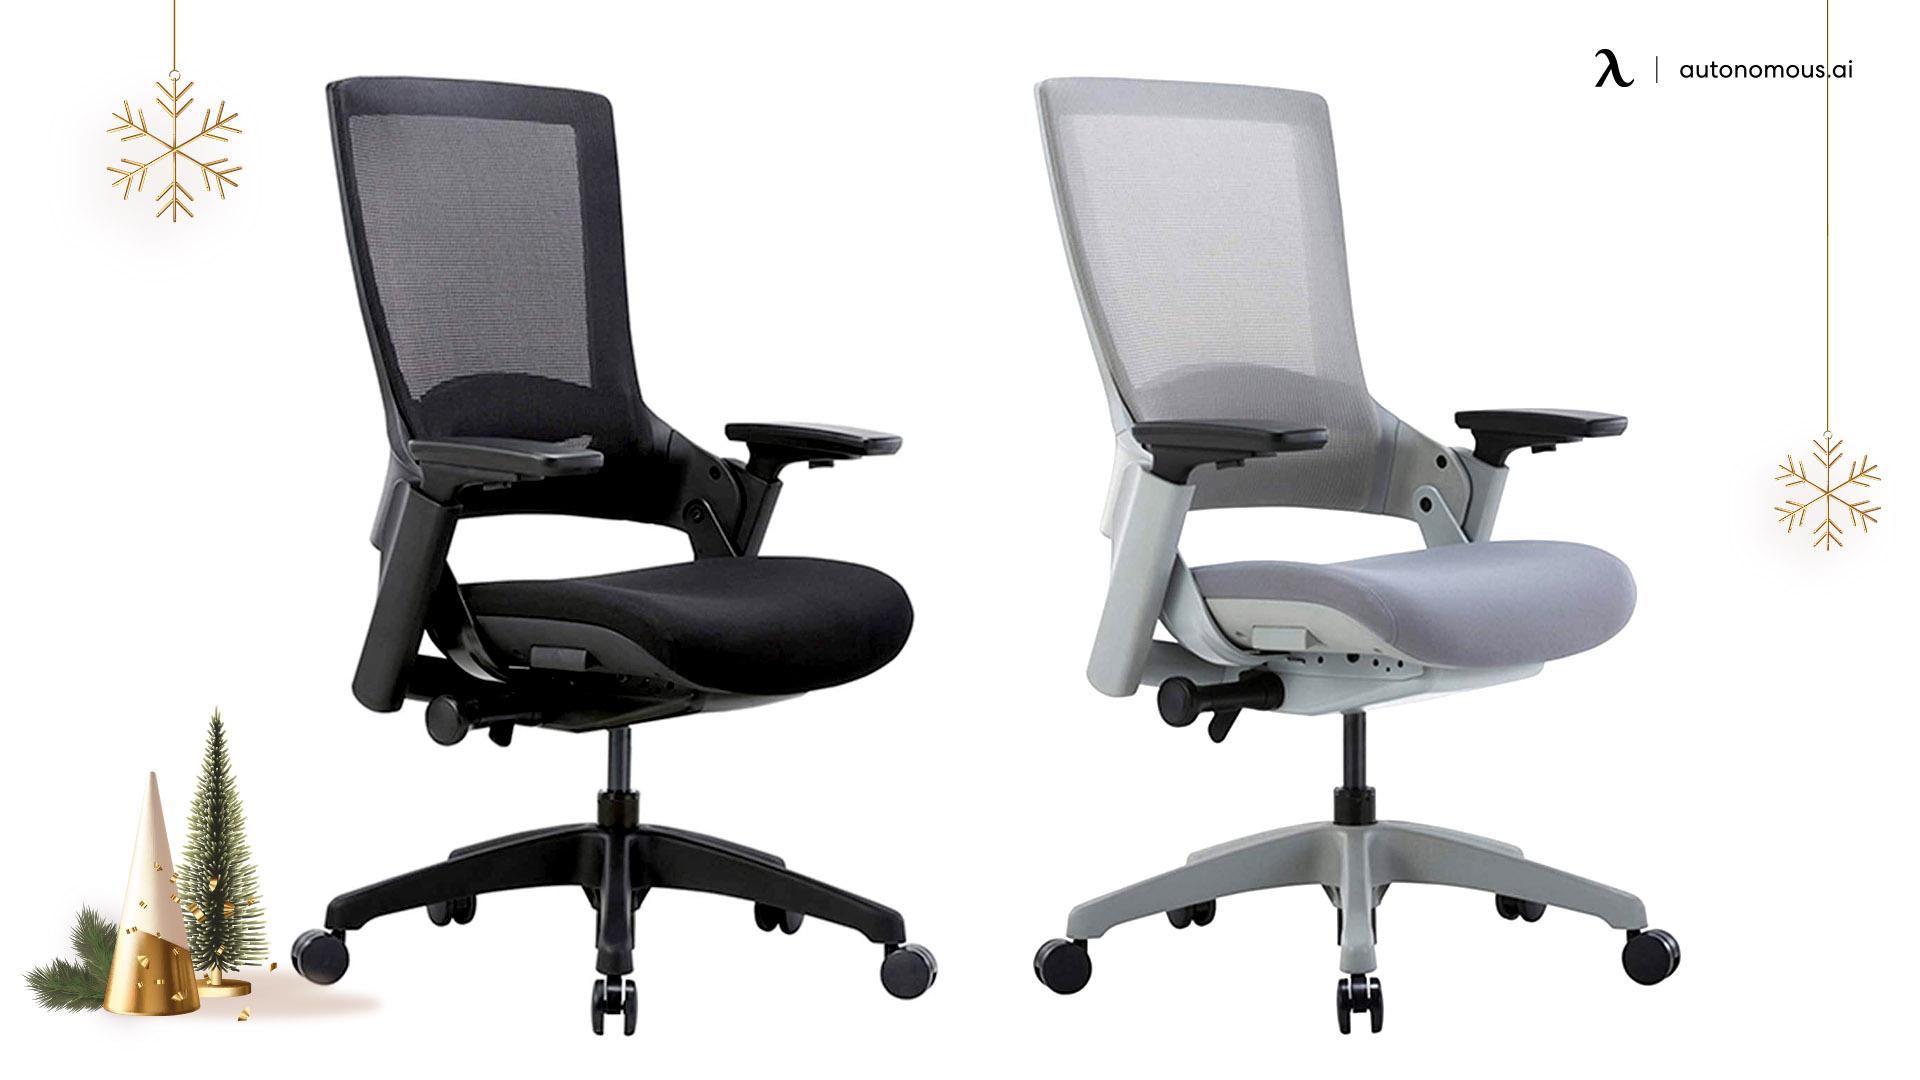 Clatina Ergonomic Chair